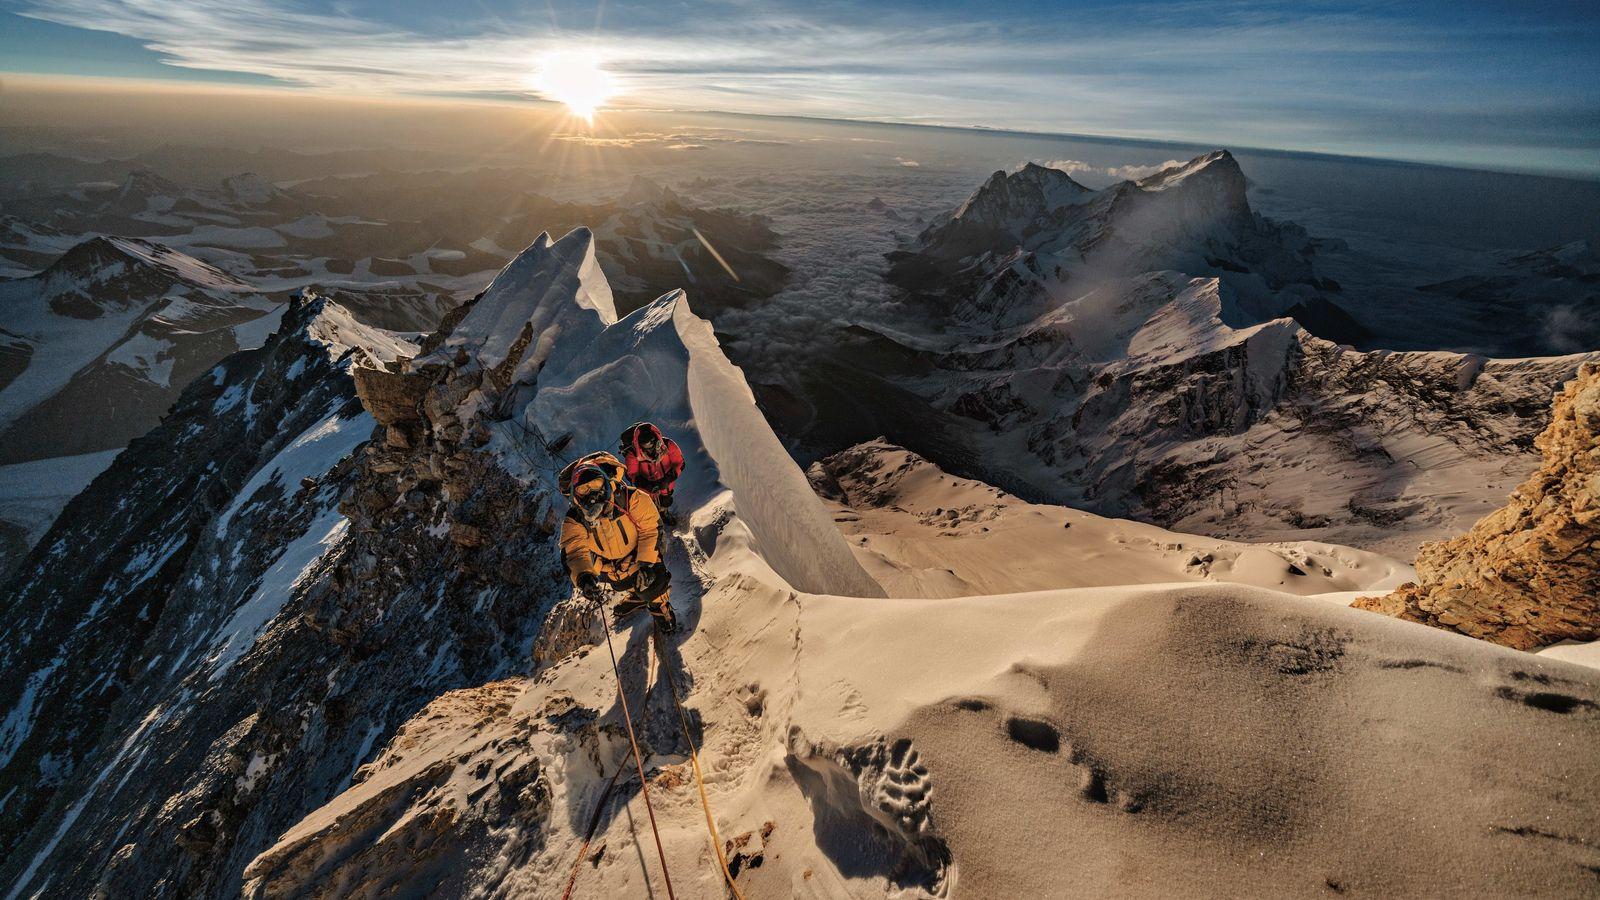 Pasang Kaji Sherpa (devant) et Lhakpa Tenje Sherpa atteignent 8750 m d'altitude sur l'Everest. La grande ...